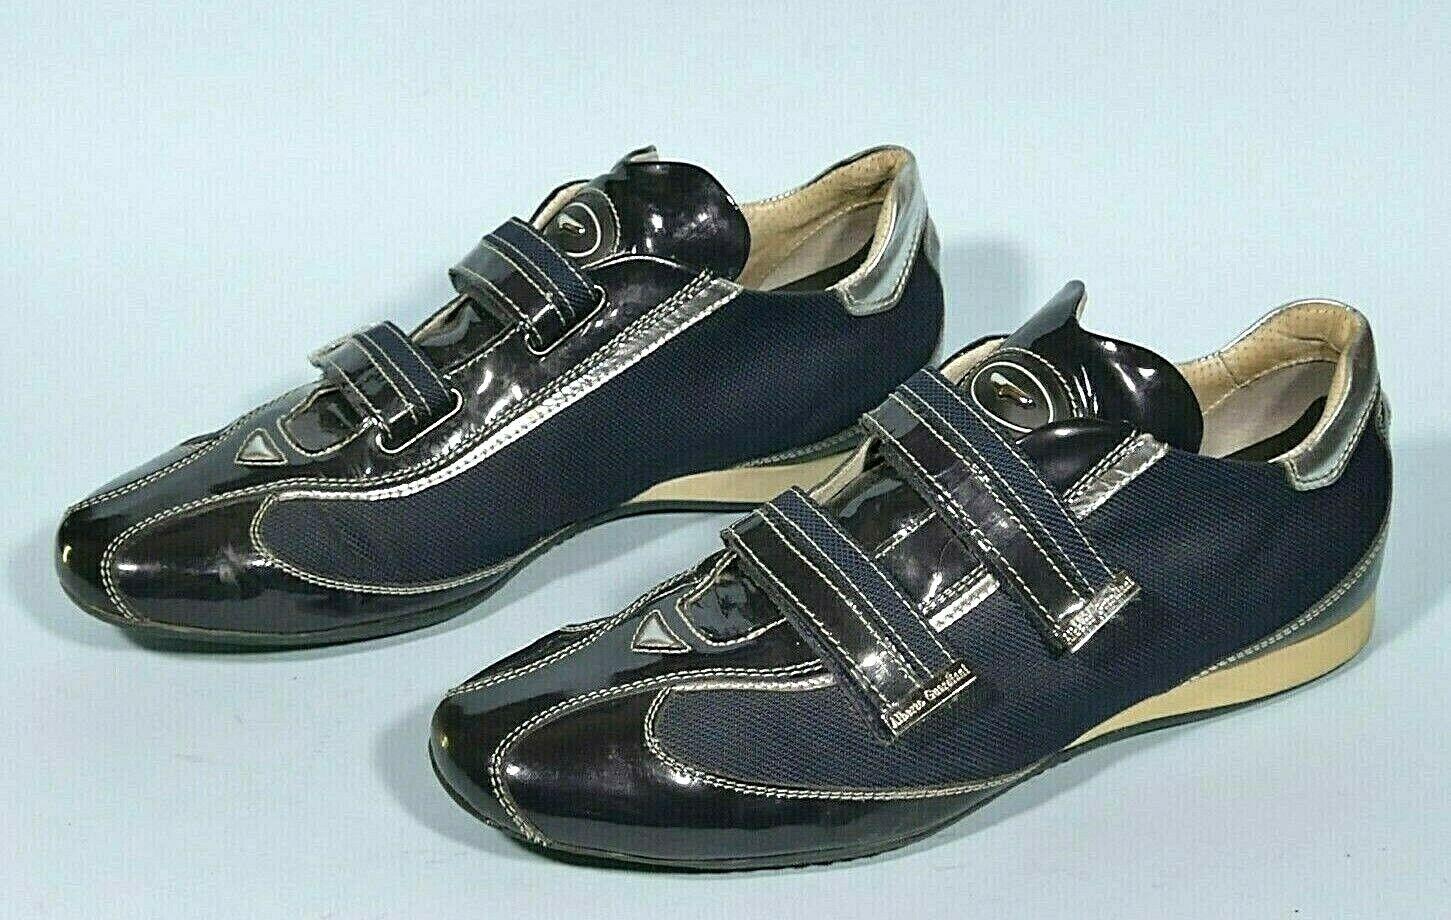 Schuhe Alberto Alberto Alberto GUARDIANI Herren Designer Schuhe,Turnschuhe,Exklusiv,Gr.44,TOP 29cc0e